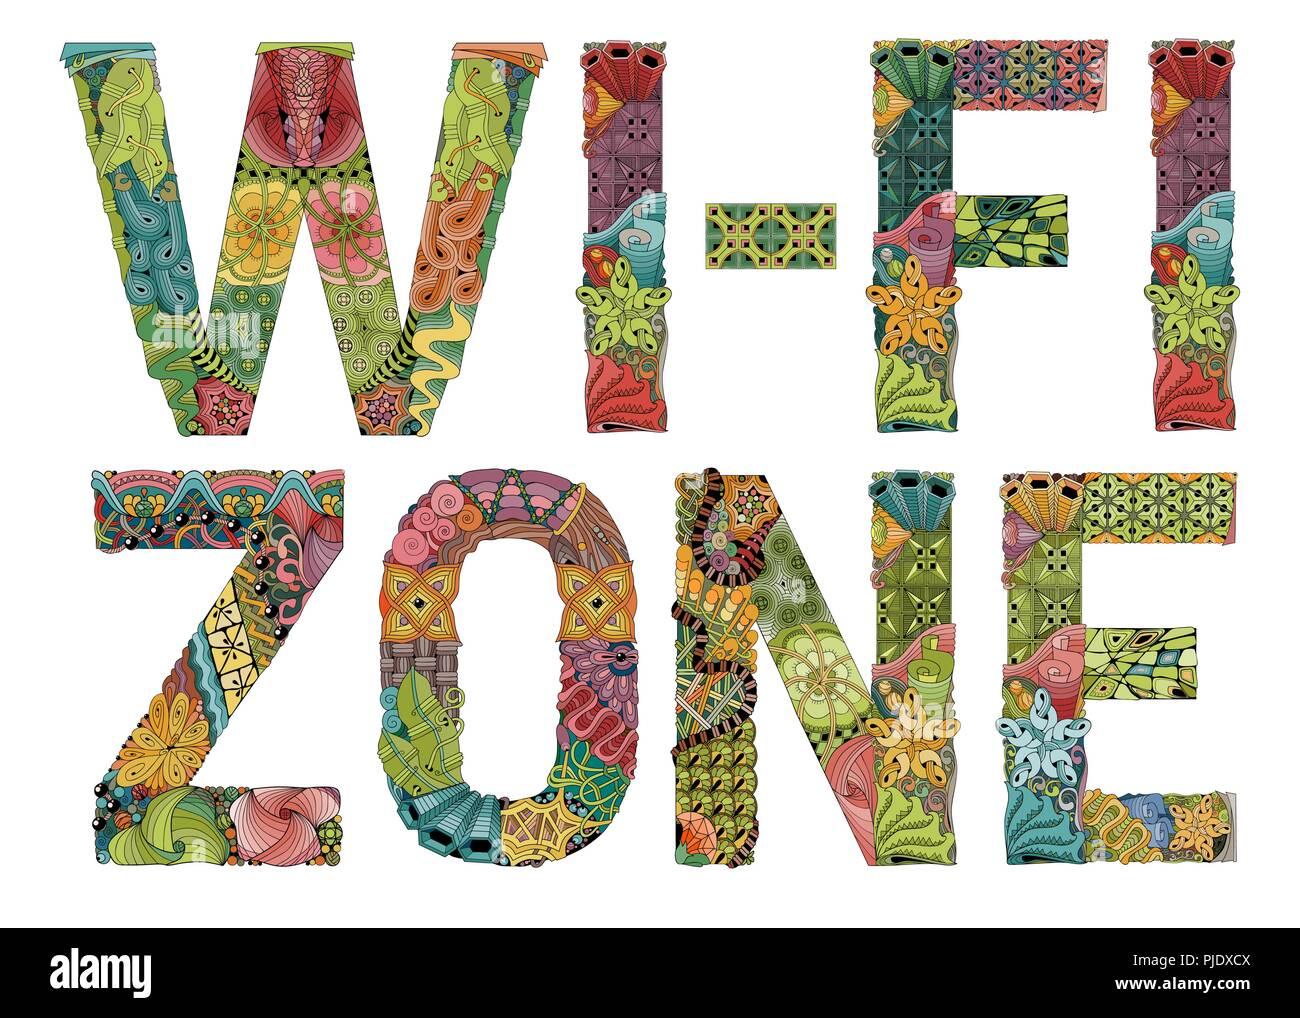 Mots WI-FI zone. Objet décoratif de scénario zentangle Photo Stock